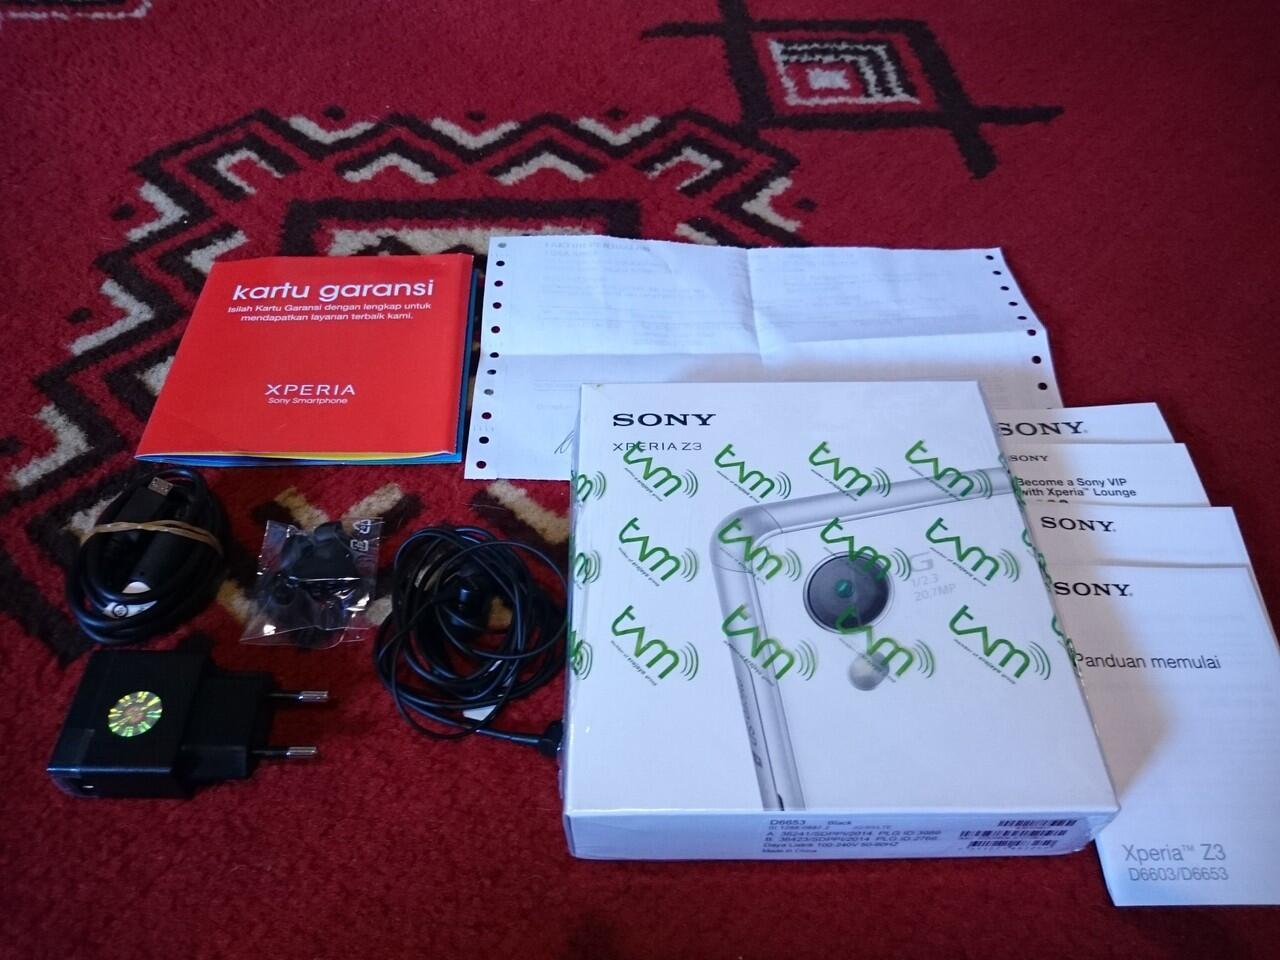 Sony Xperia Z3 Black Fullset Like New Garansi Sony Indonesia Januari 2016